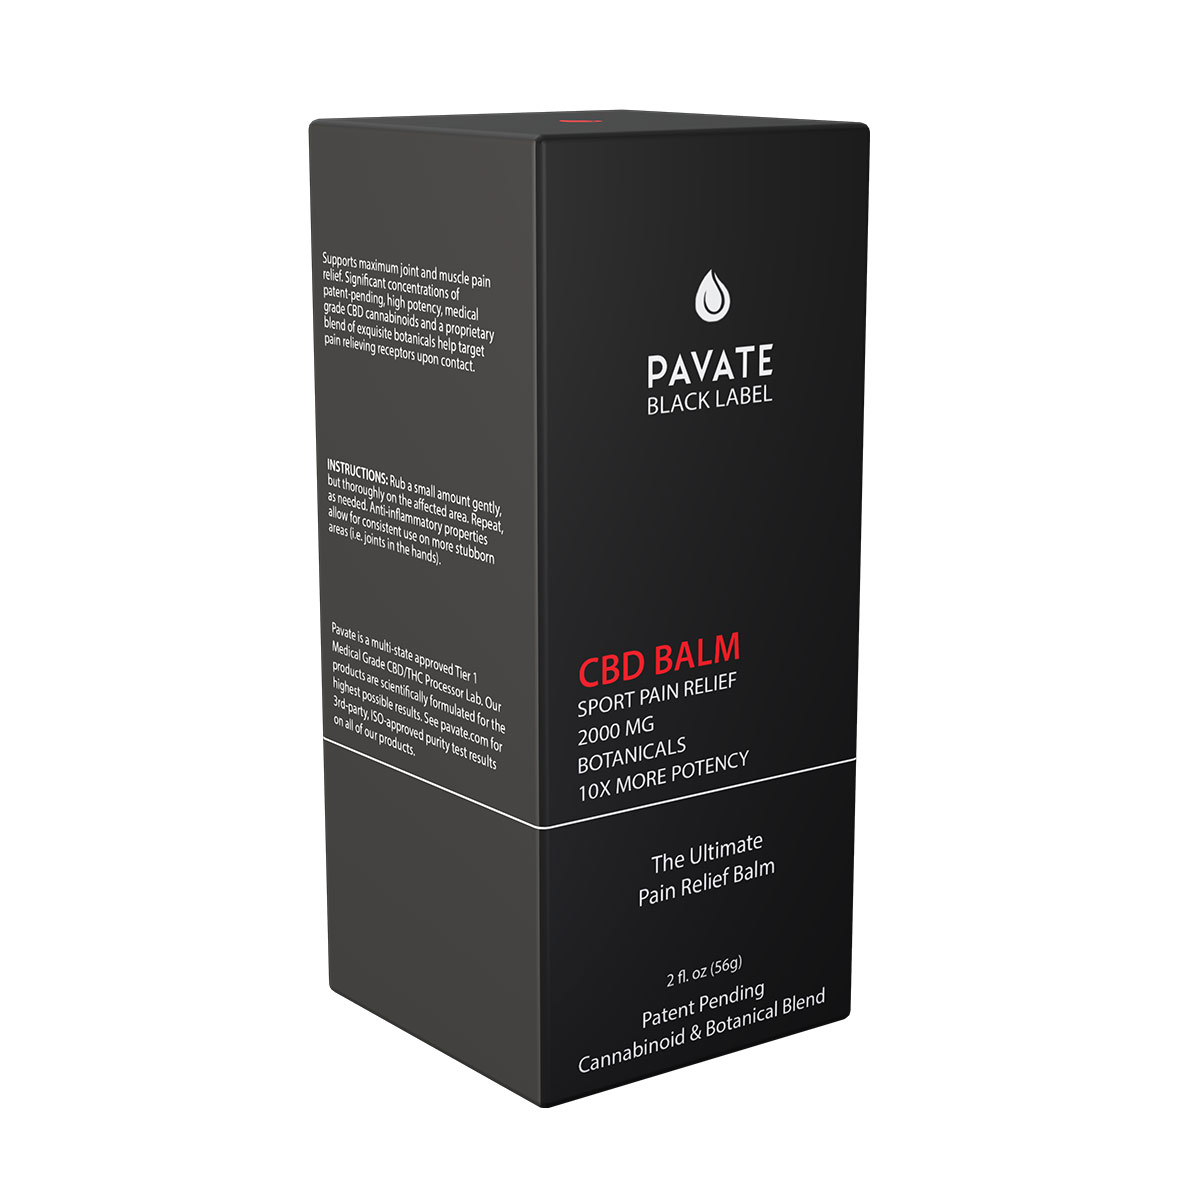 Pavate-Black-Label-Pain-Sport-Balm-2000mg-box